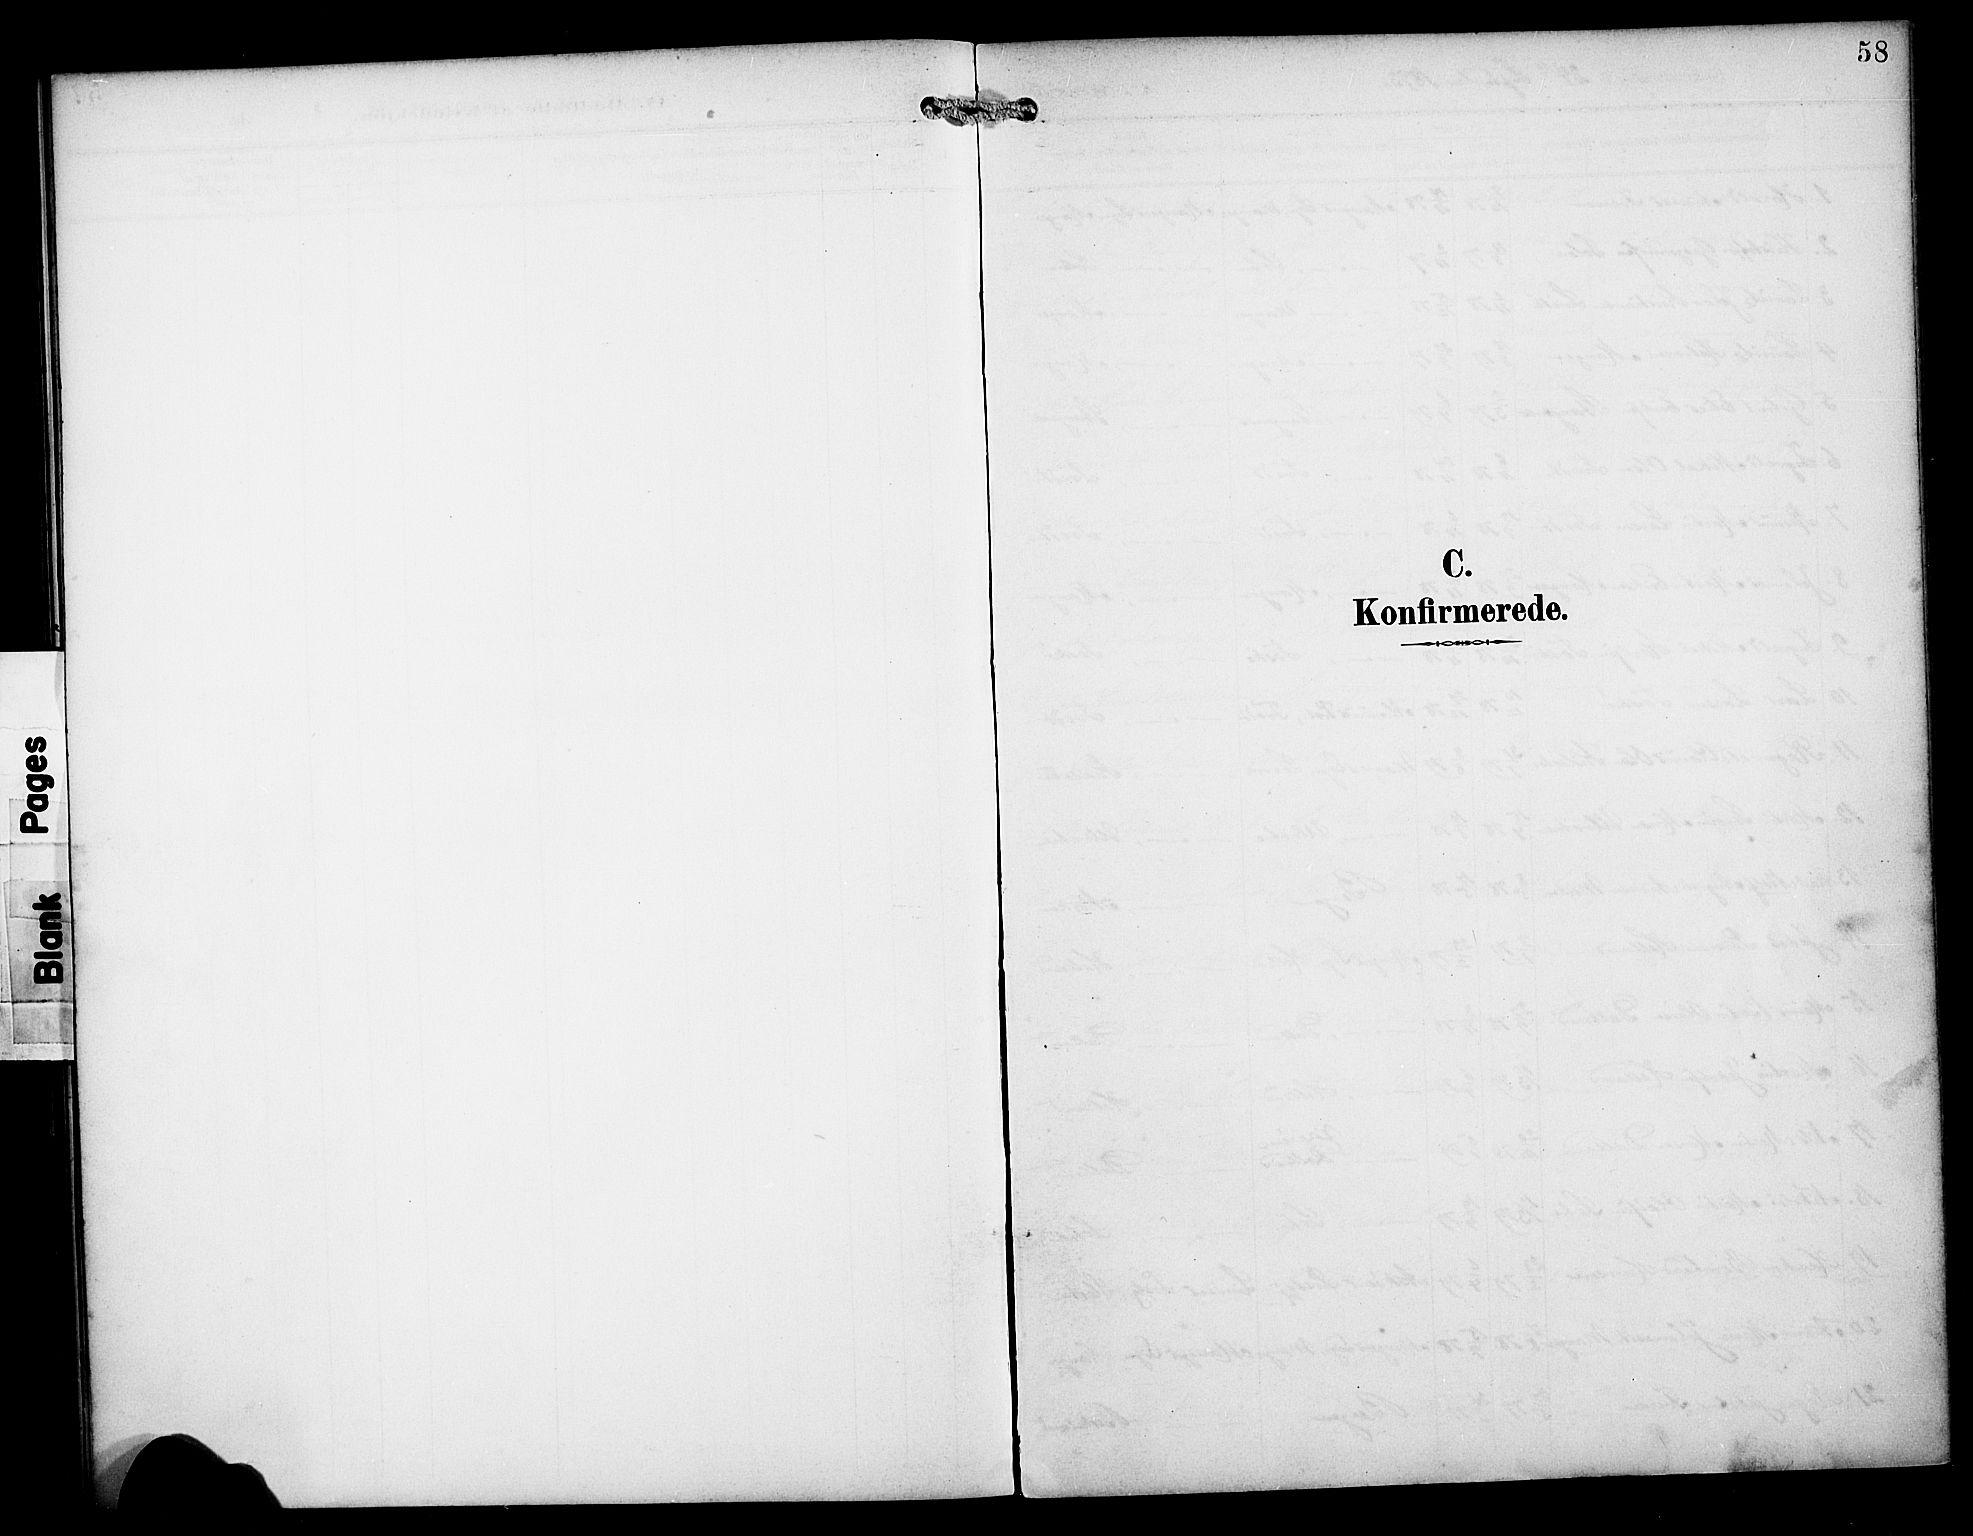 SAB, Manger sokneprestembete, H/Haa: Ministerialbok nr. B 2, 1893-1906, s. 58